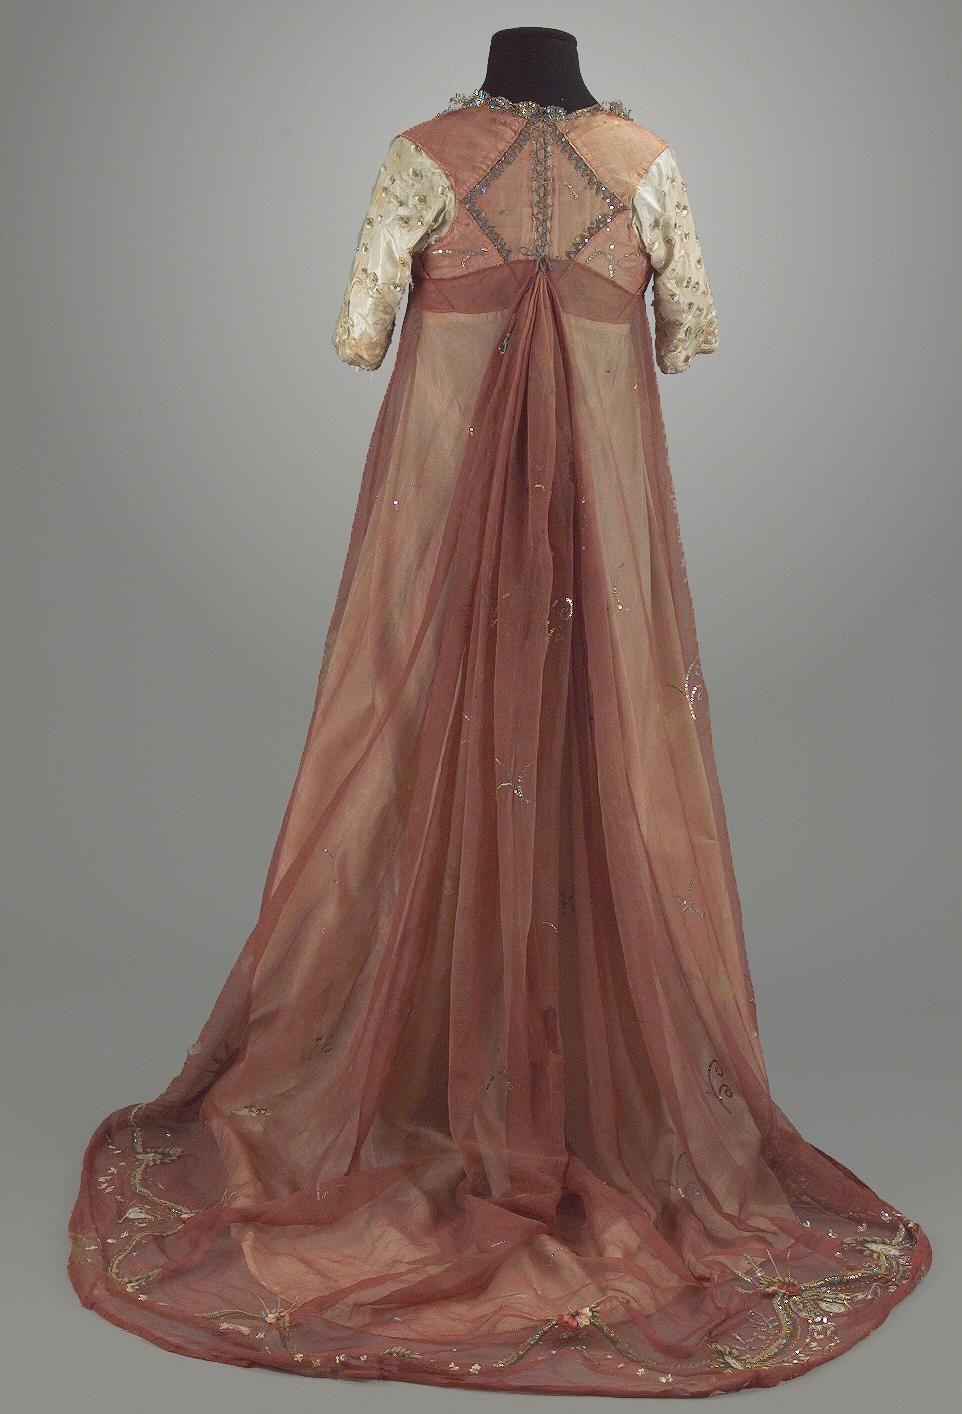 1795 1810 gown 1800 1810 pinterest sch ne kleidung. Black Bedroom Furniture Sets. Home Design Ideas